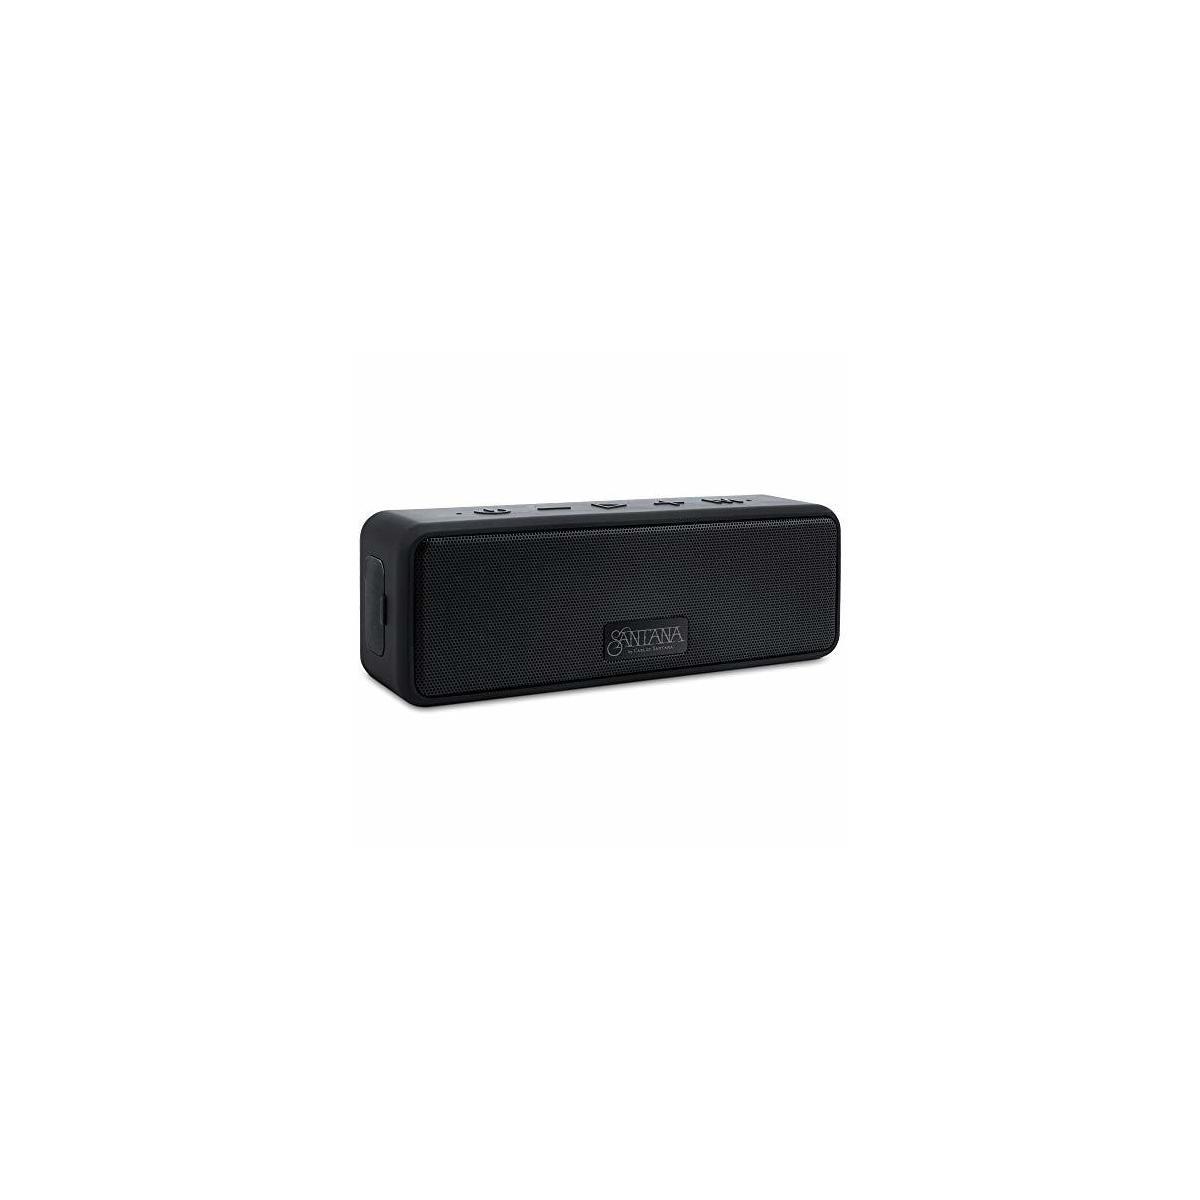 Carlos Santana Samba Bluetooth Speaker 20 Watt Stereo Waterproof